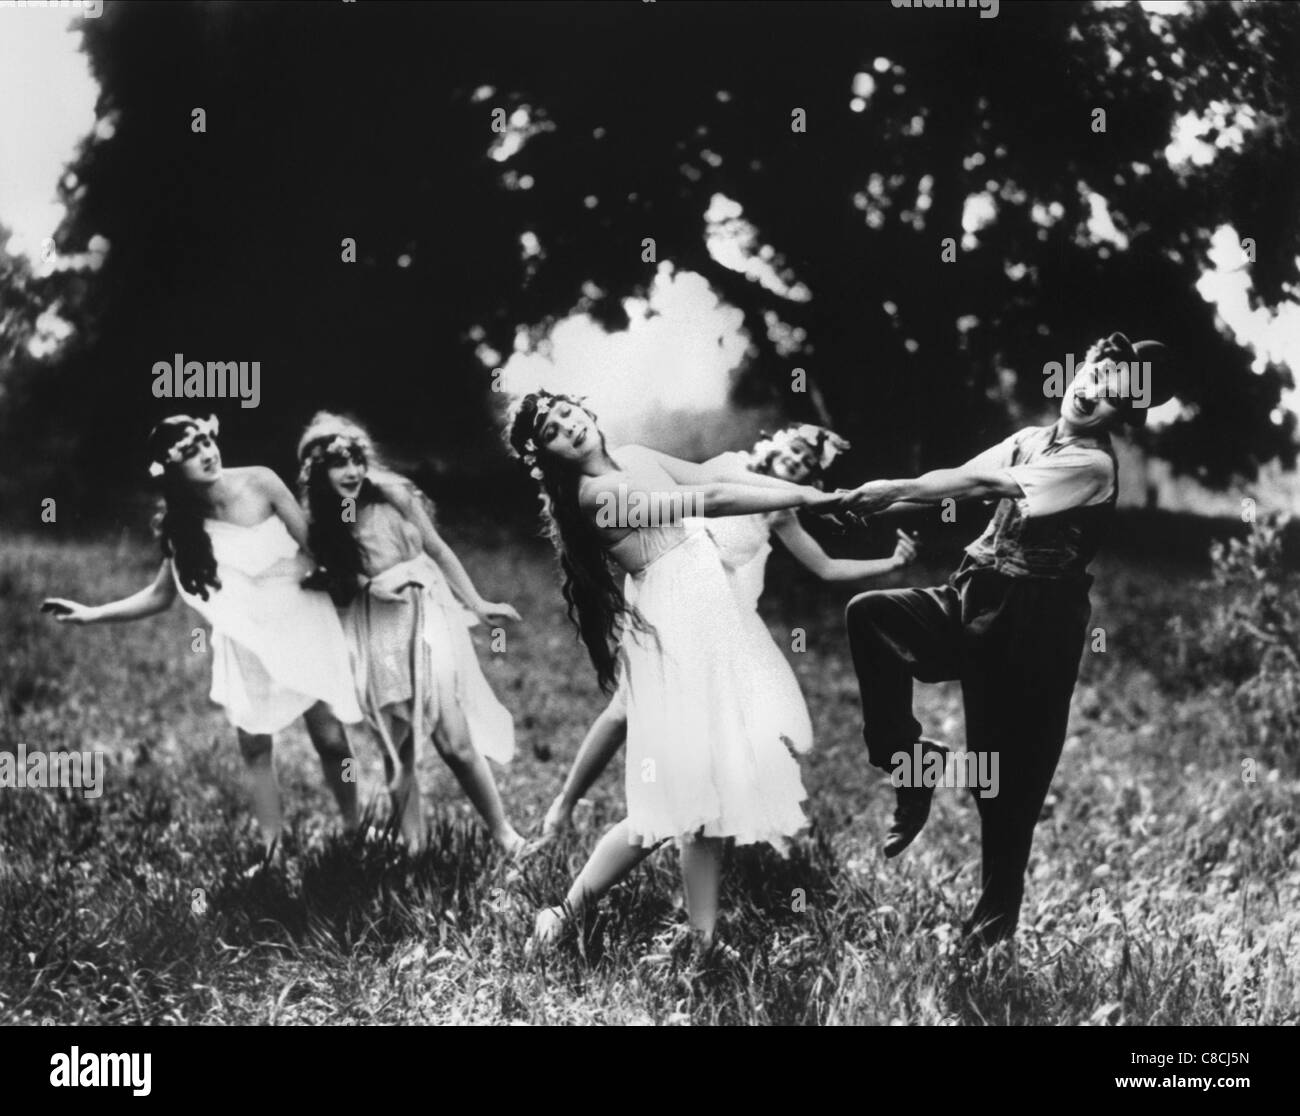 CHARLES CHAPLIN SUNNYSIDE (1919) - Stock Image